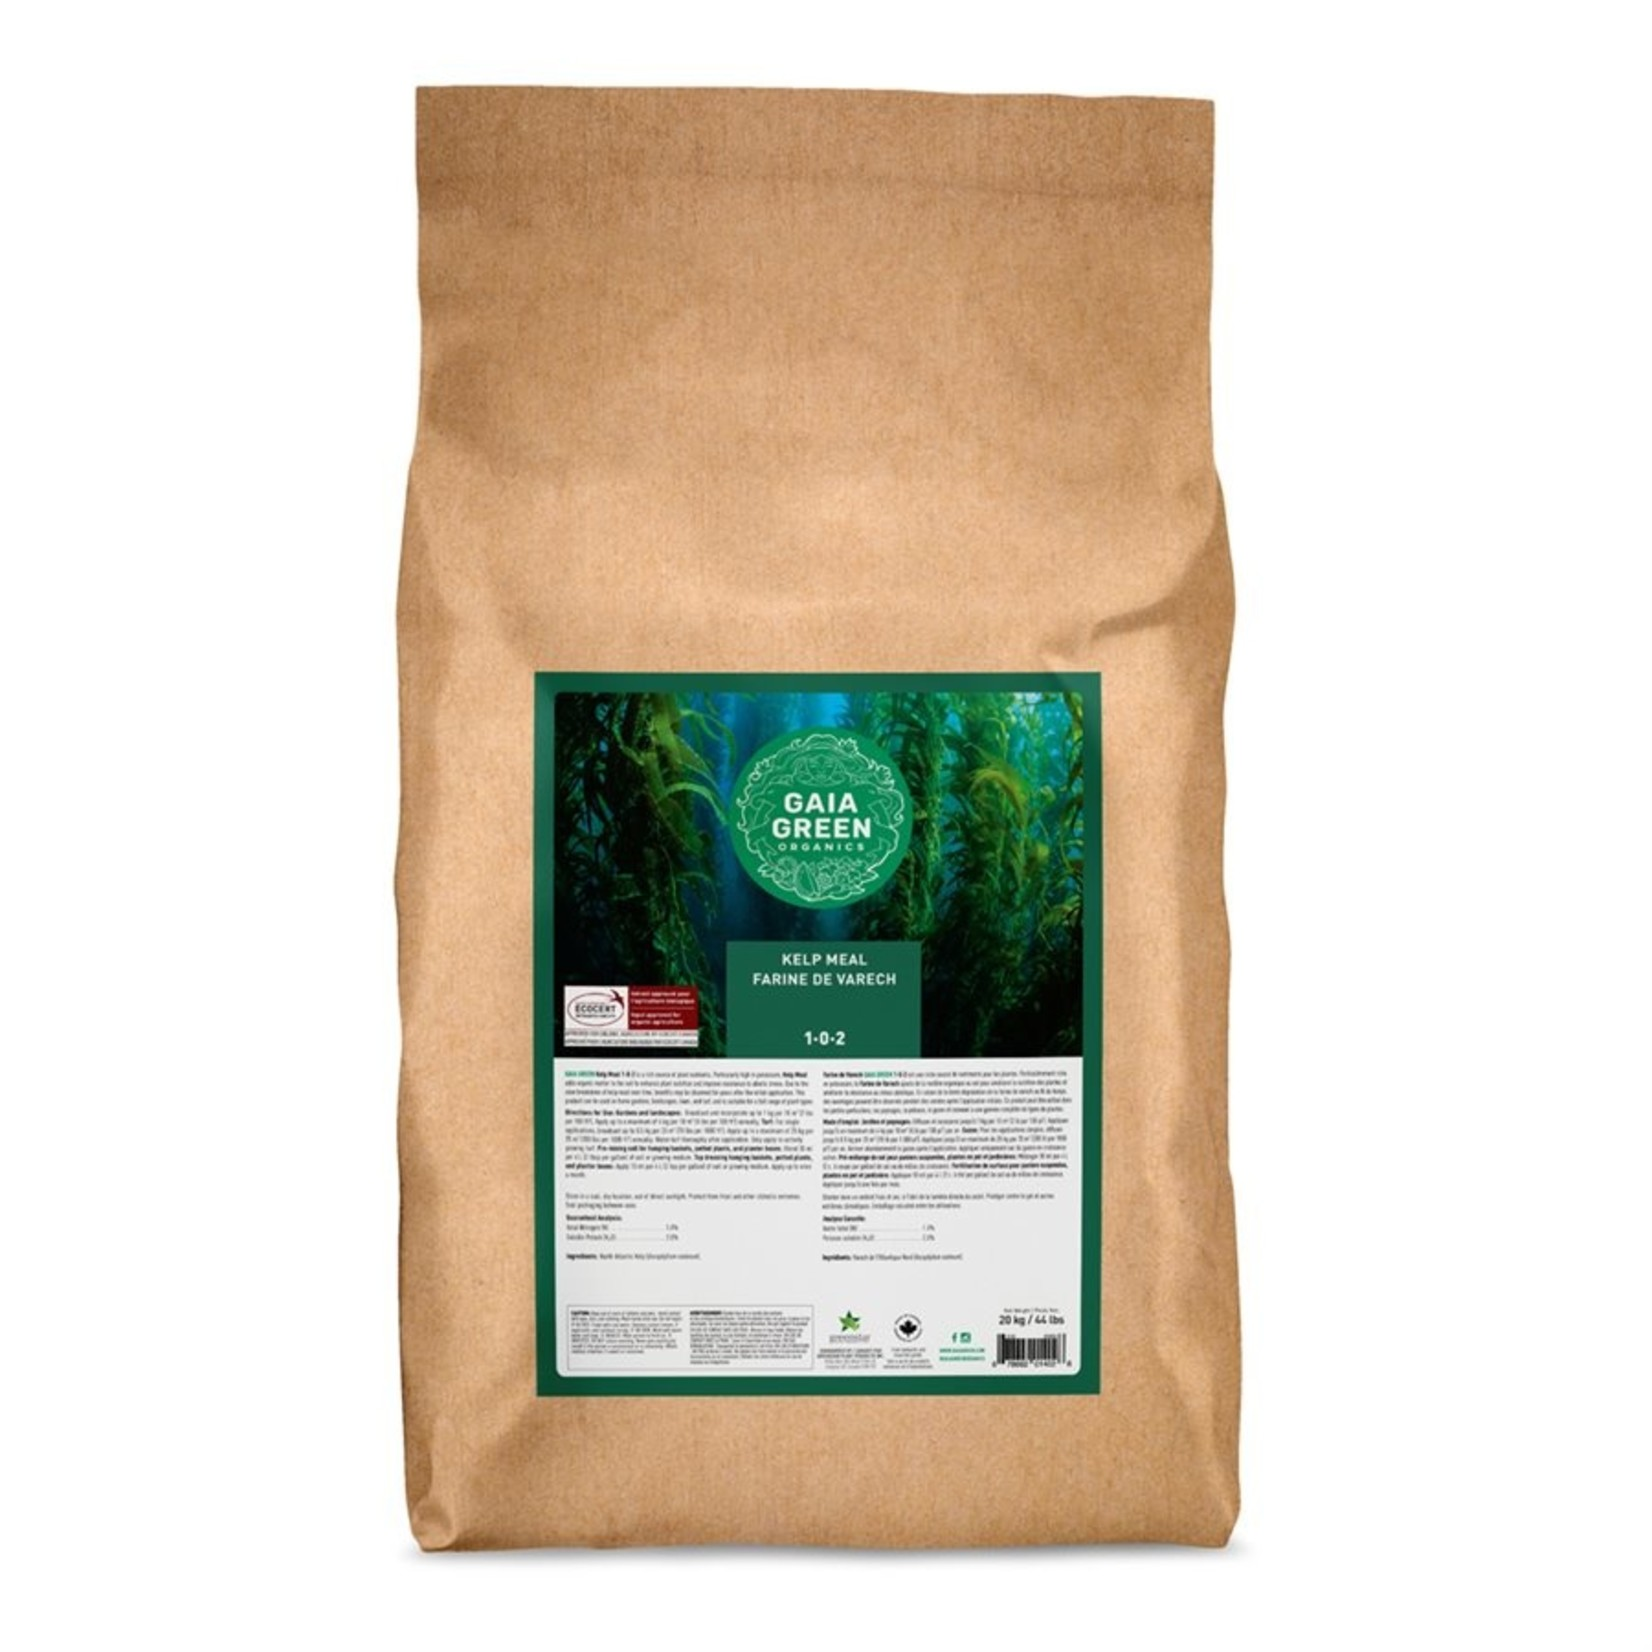 GAIA GREEN KELP MEAL 1-0-2 20 KG